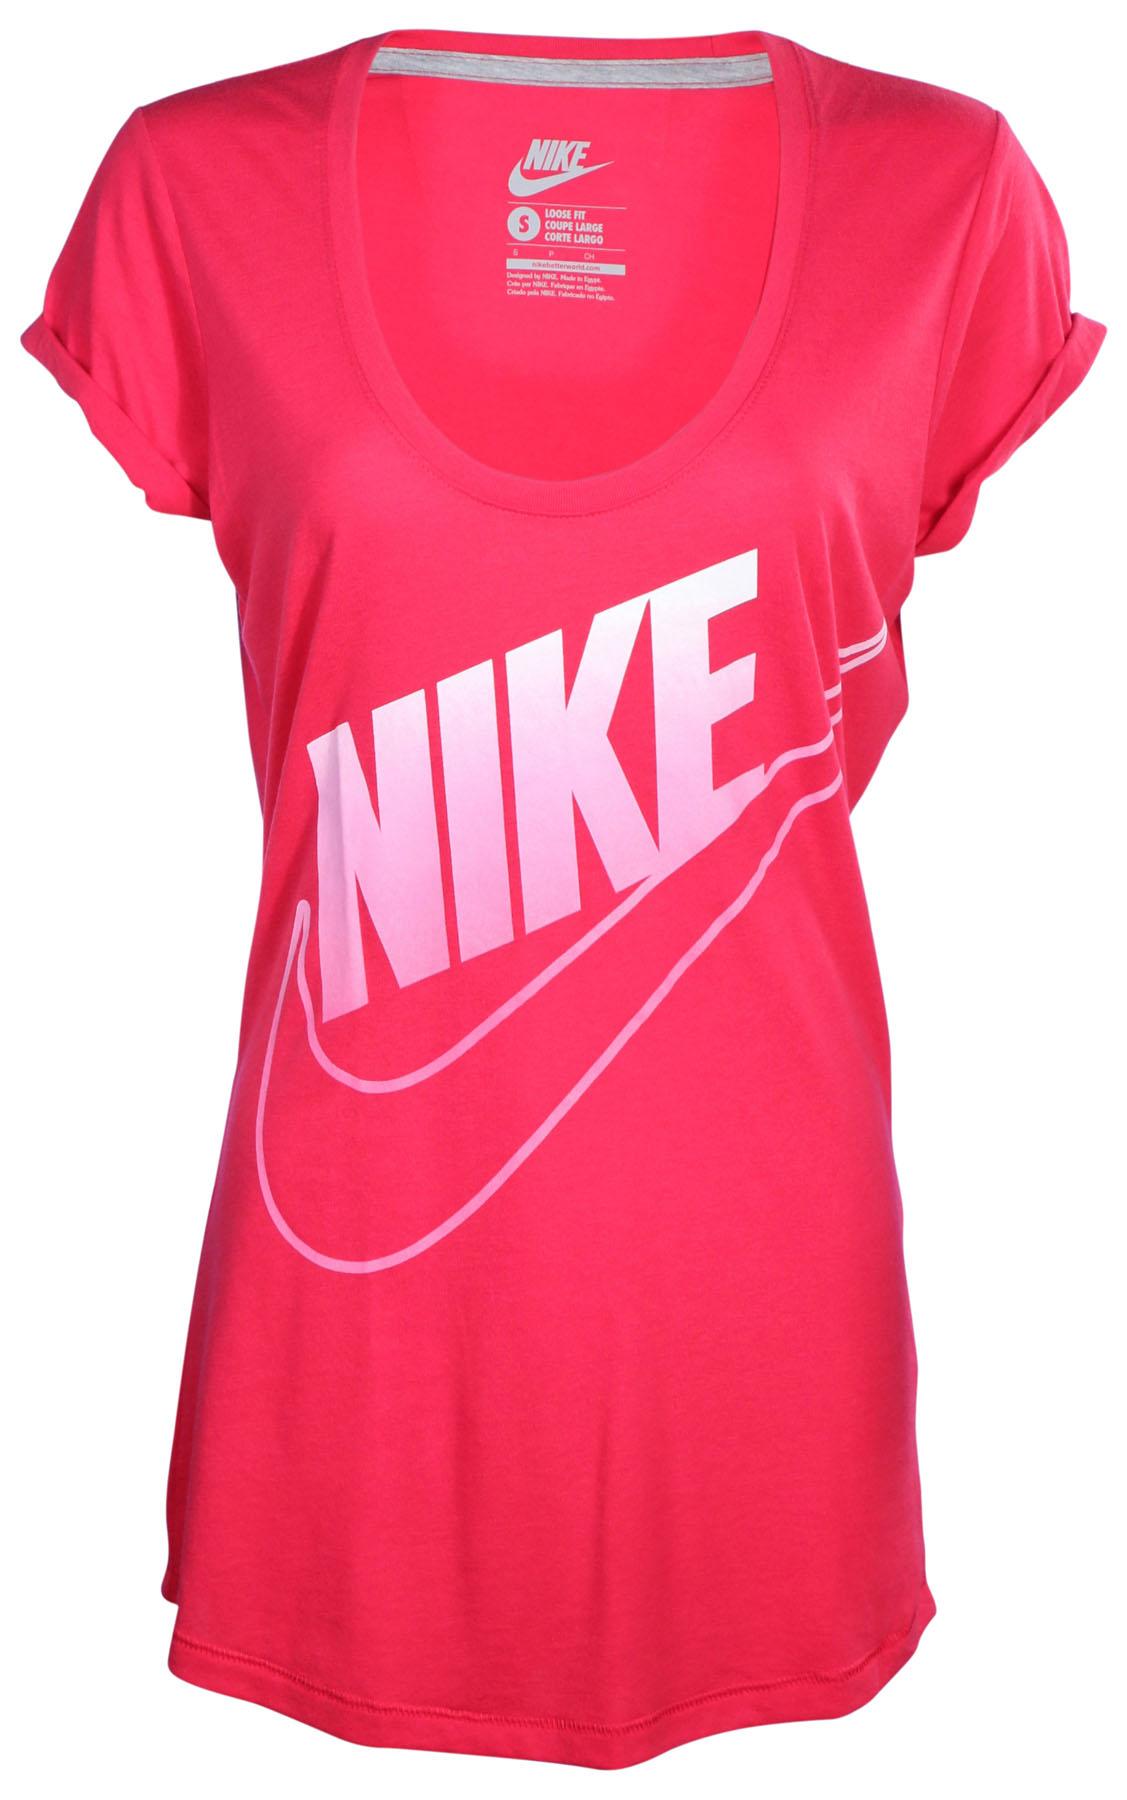 Nike Women's Oversized Nike Swoosh Loose Fit T Shirt | eBay